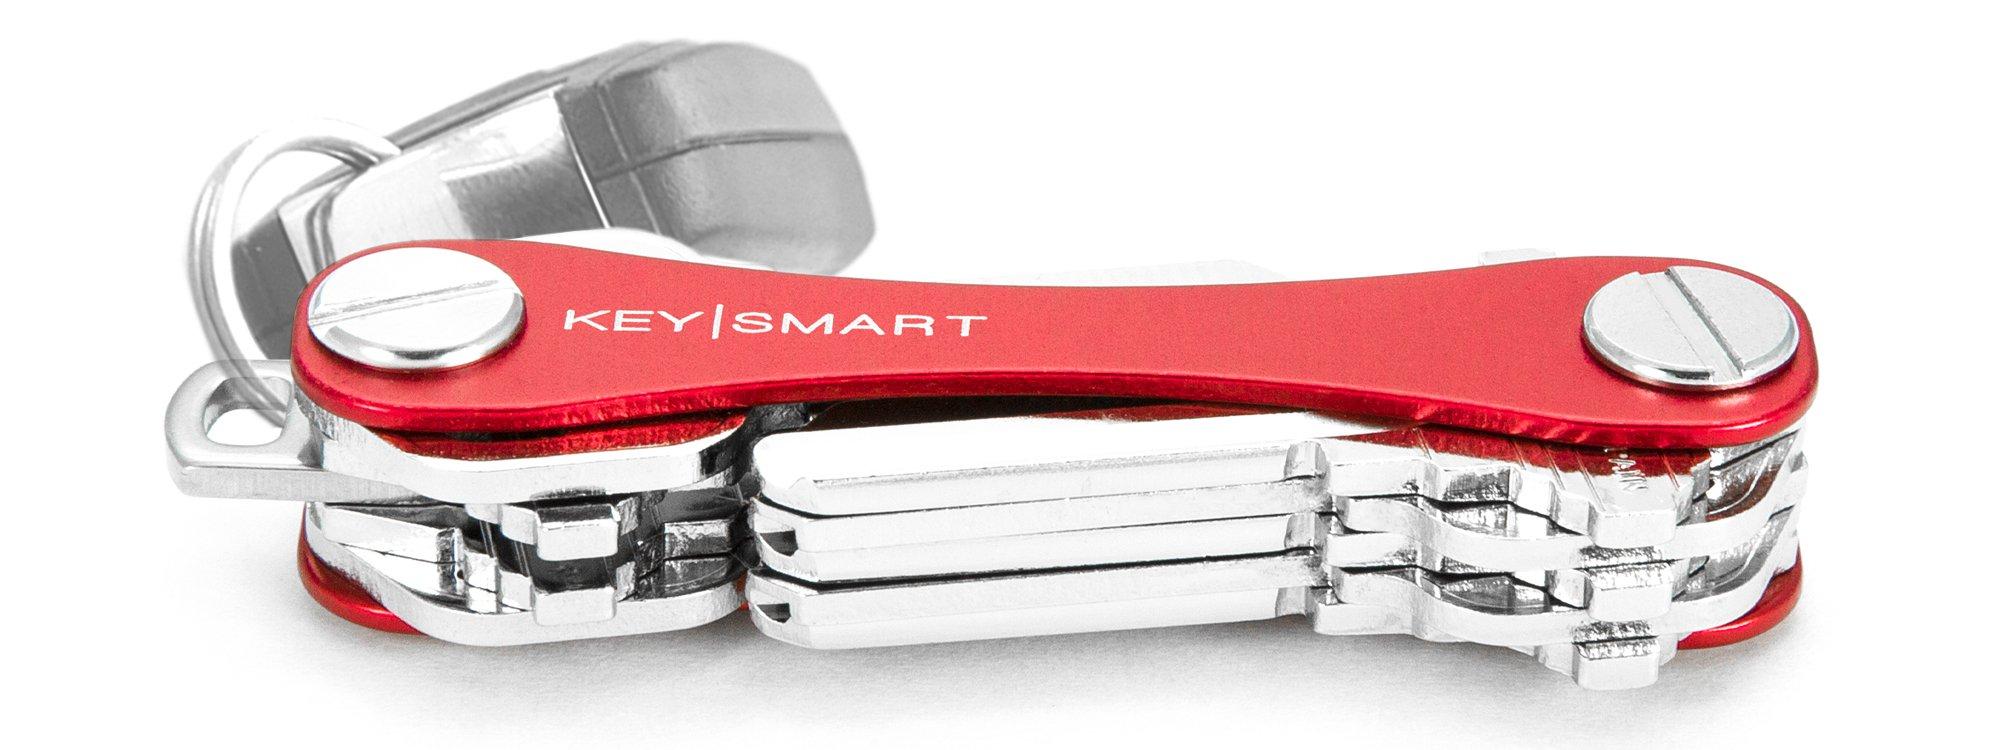 KeySmart Classic | Compact Key Holder and Keychain Organizer (2-14 Keys, Red)